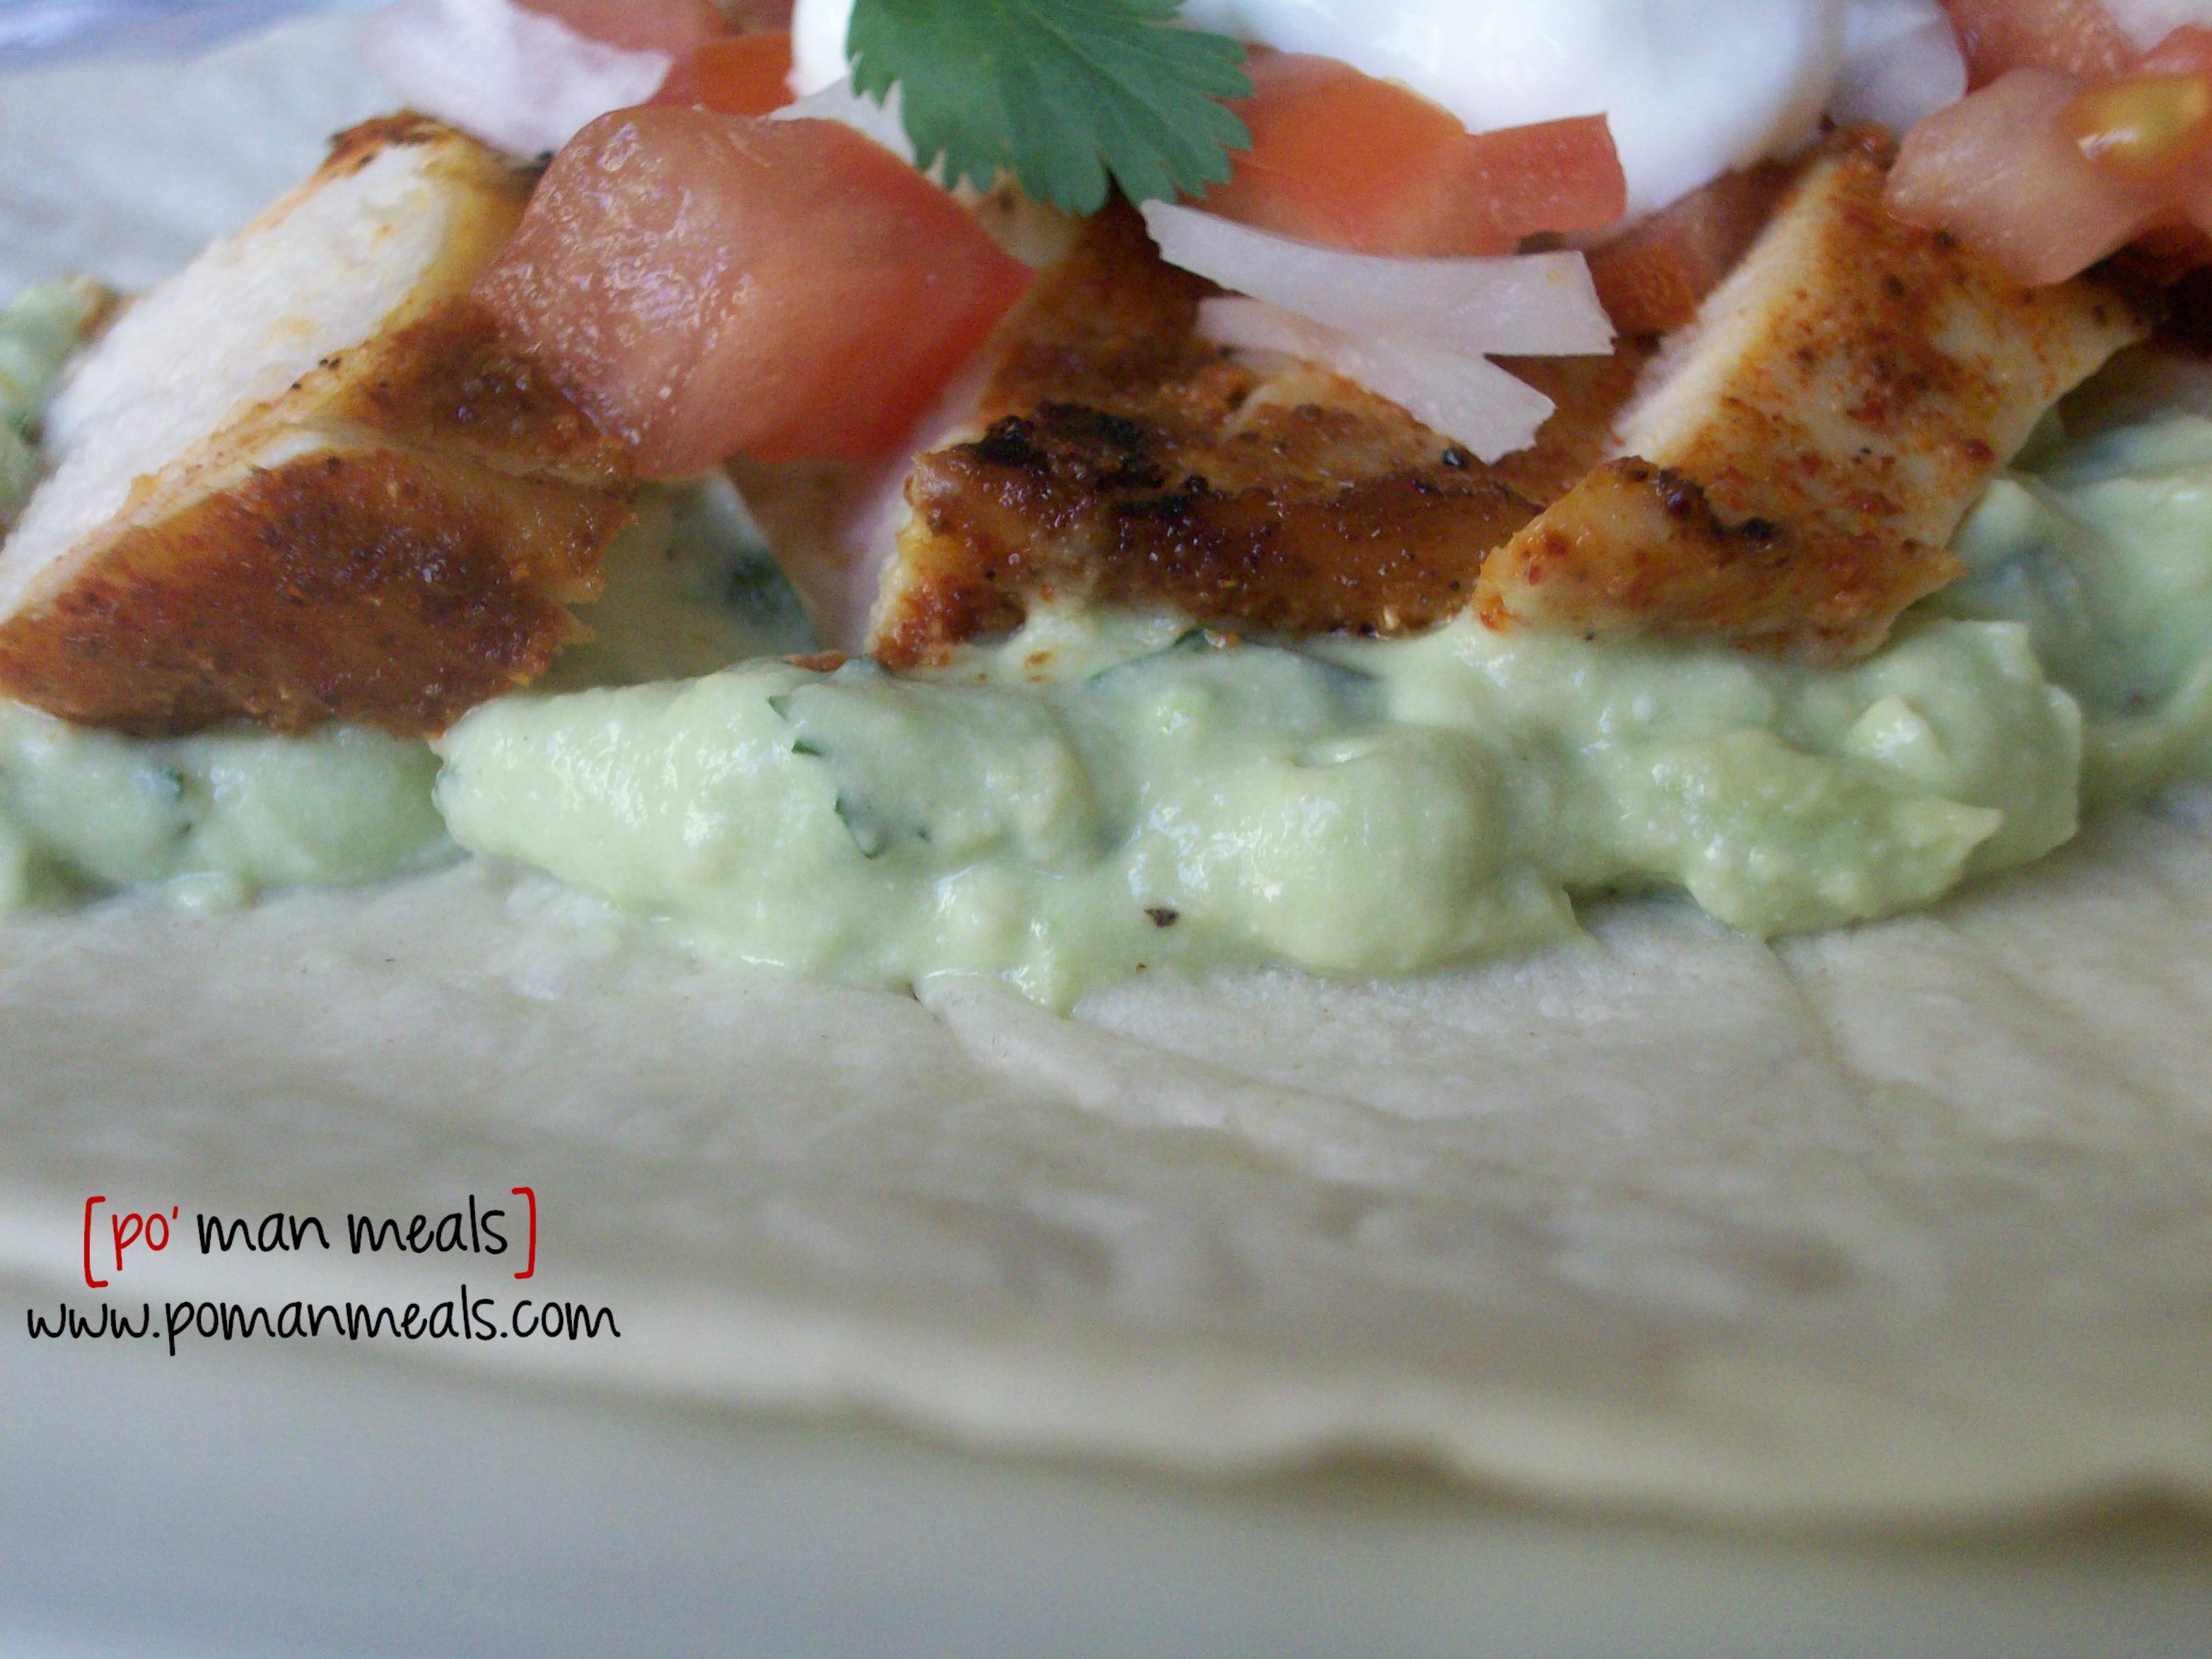 grilled-chicken-soft-tacos-with-avocado-cream3wm